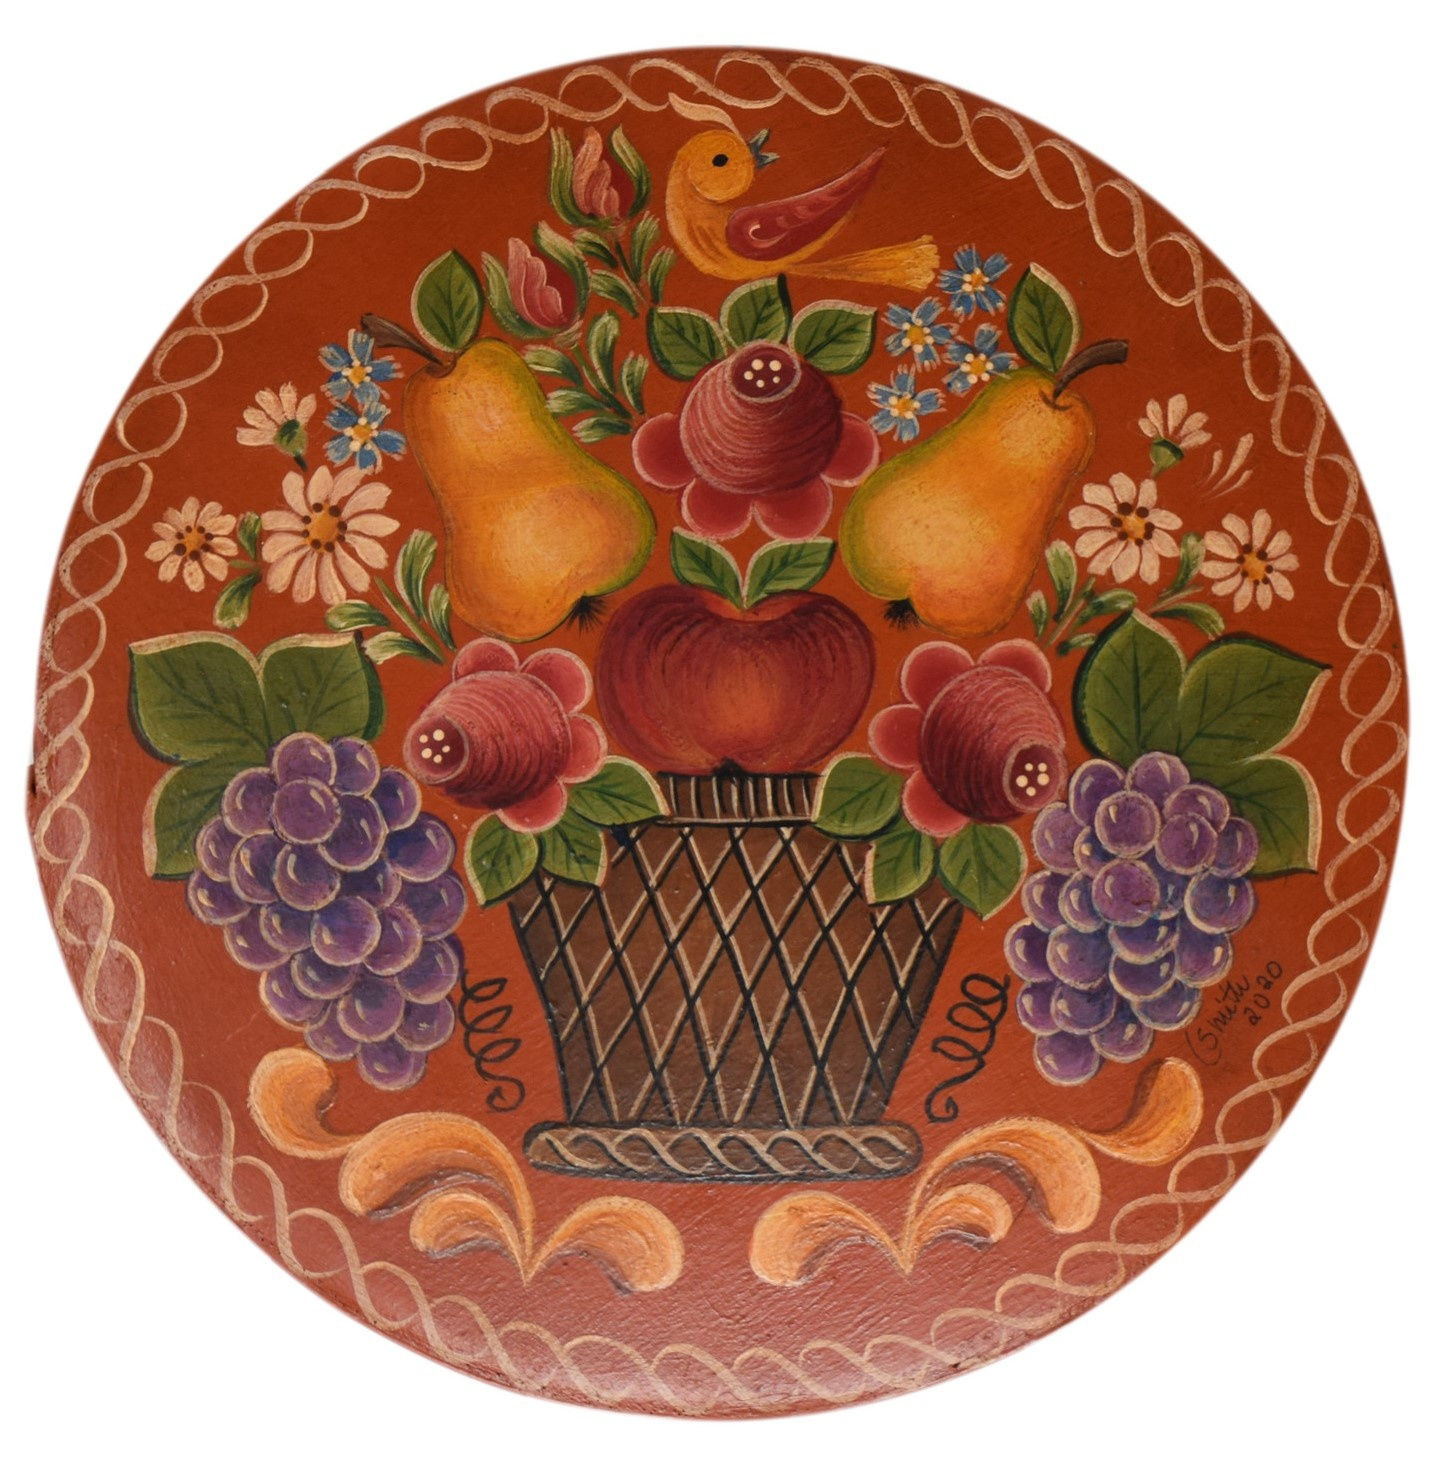 Round Box dark orange with basket, pears, and flowers-1